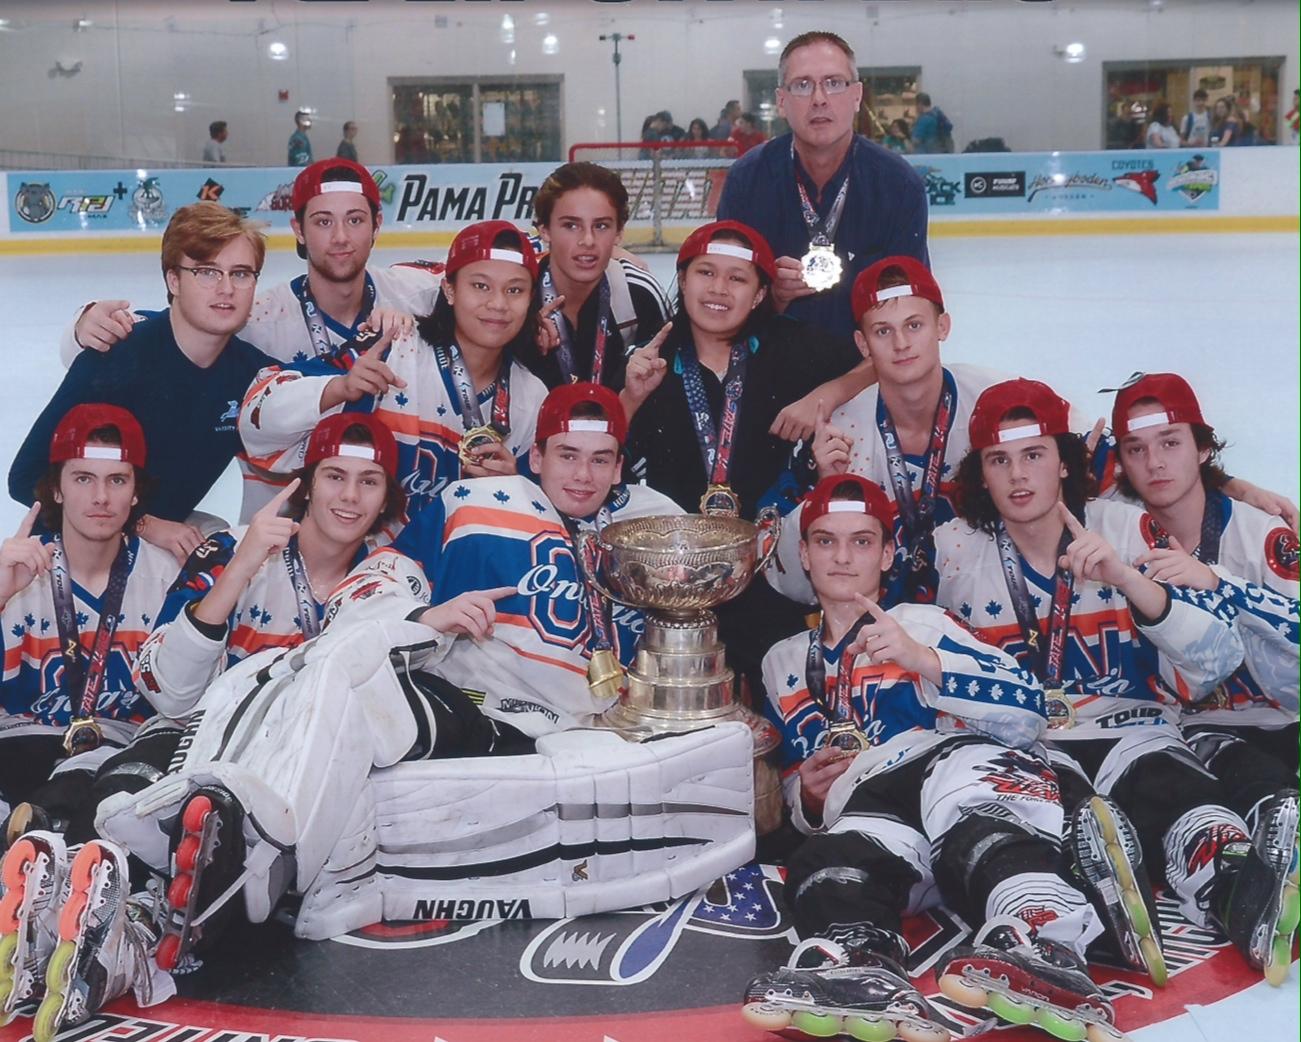 2017 Team Ontario 2000AAA State Wars Champions